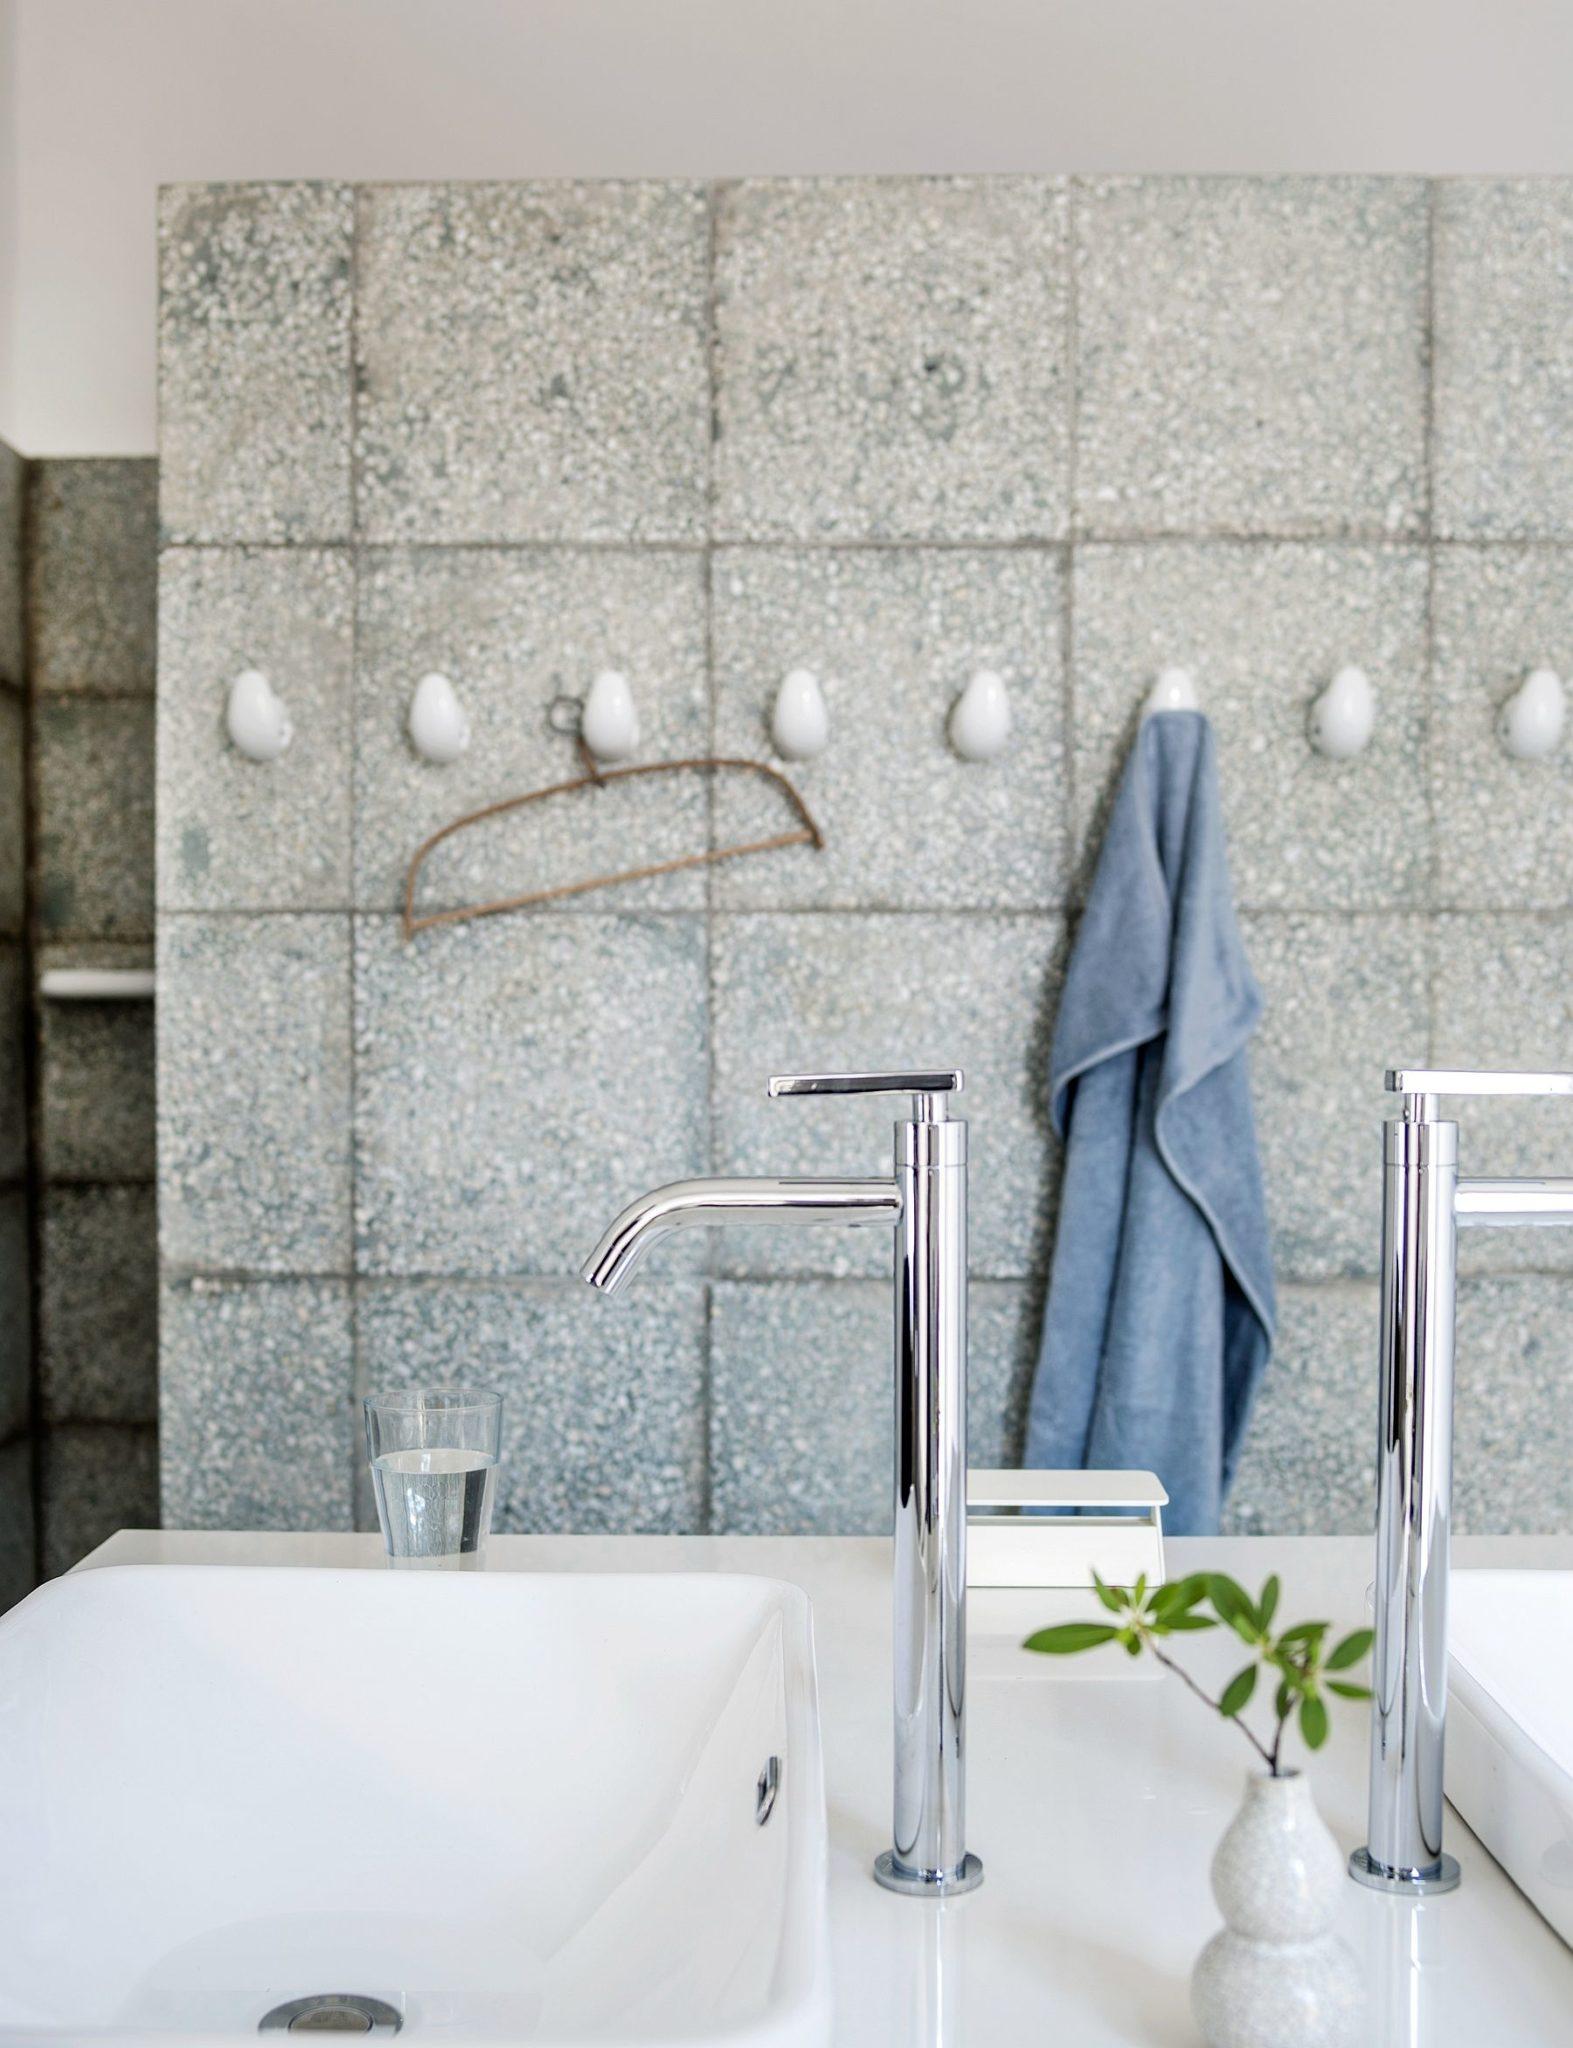 Modern rustic bathroom in white